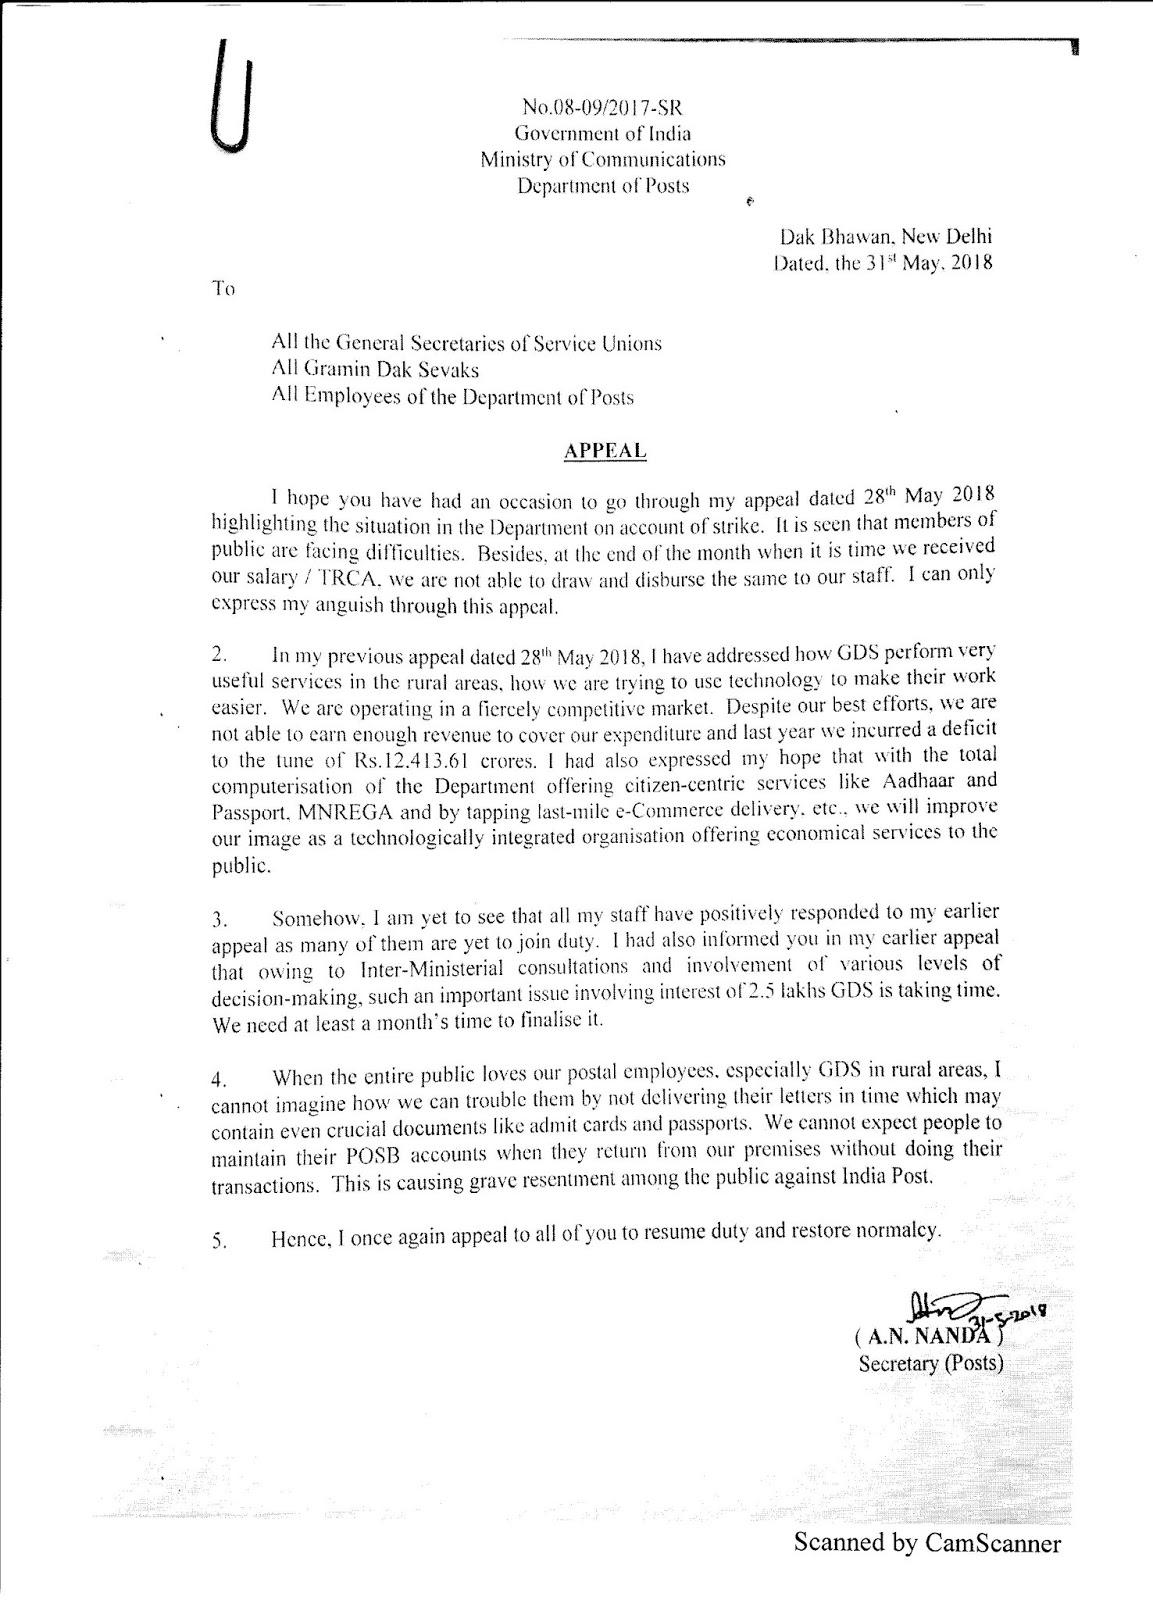 Appeal from Secretary Post on GDS Strike